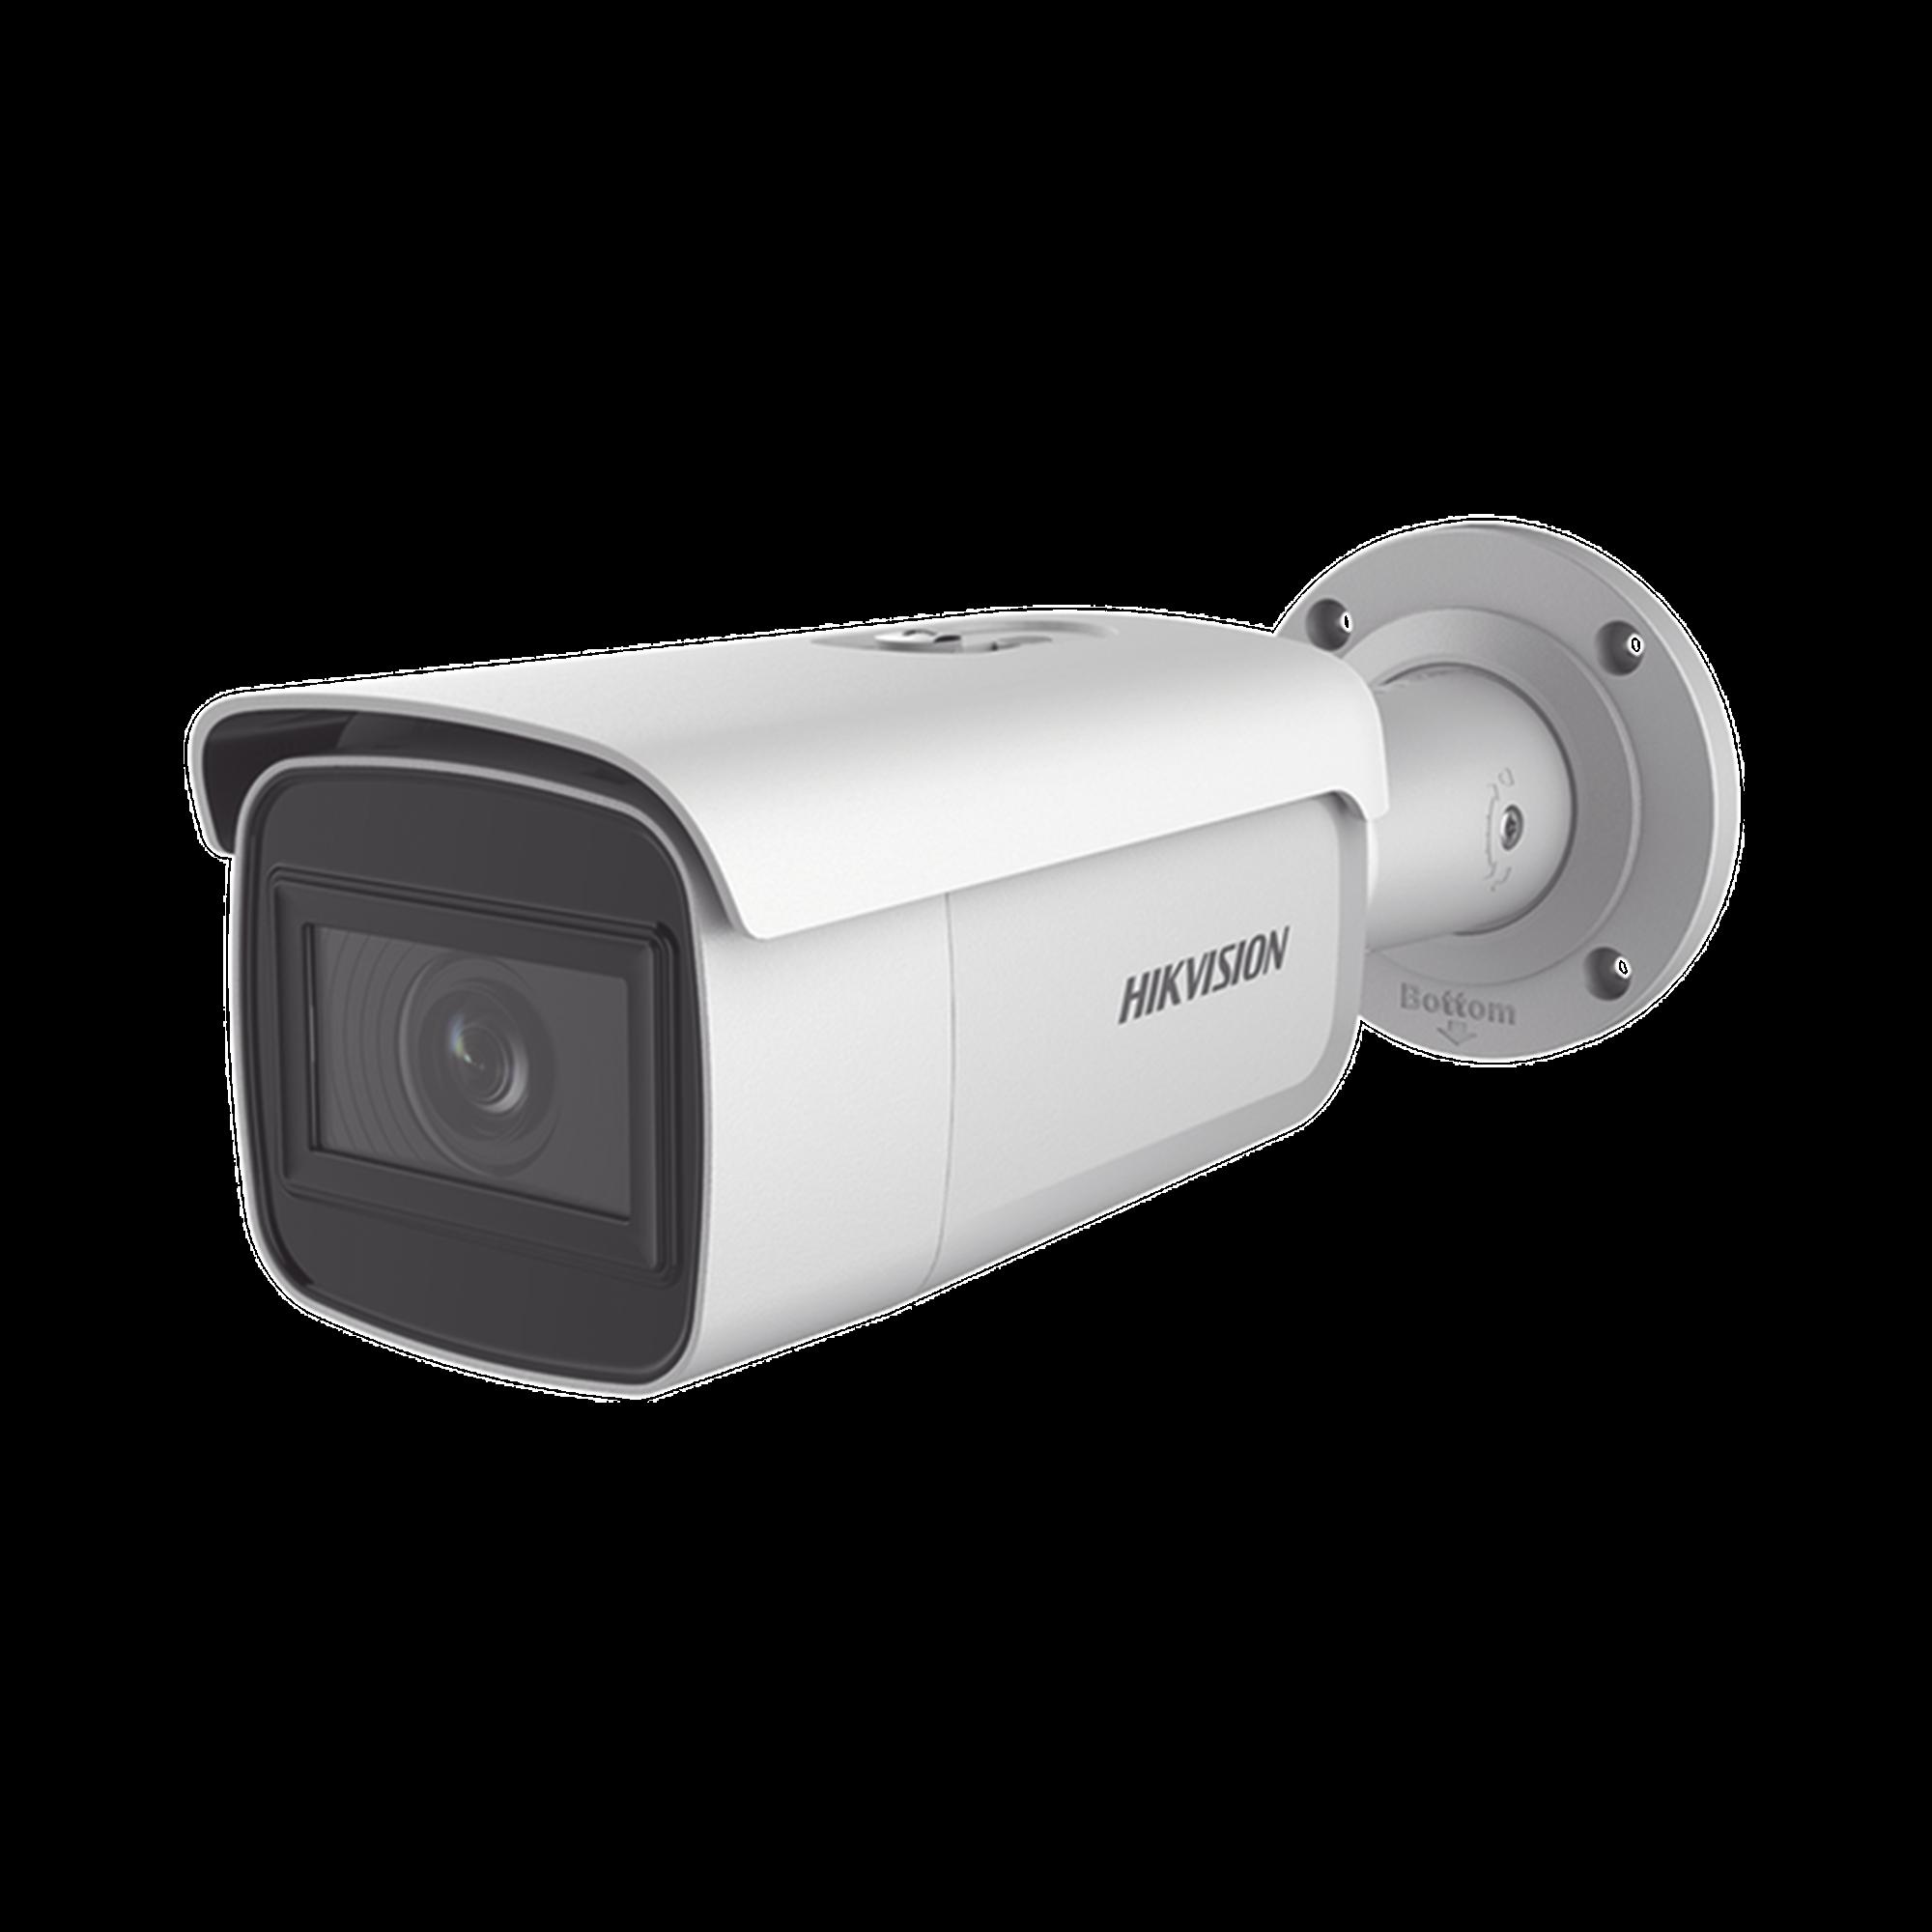 Bala IP 8 Megapixel (4K) / Serie PRO /  50 mts IR EXIR / Exterior IP67 / WDR 120 dB / PoE+ / Audio y Alarmas / Lente Mot. 2.8 a 12 mm / Videoanaliticos Integrados